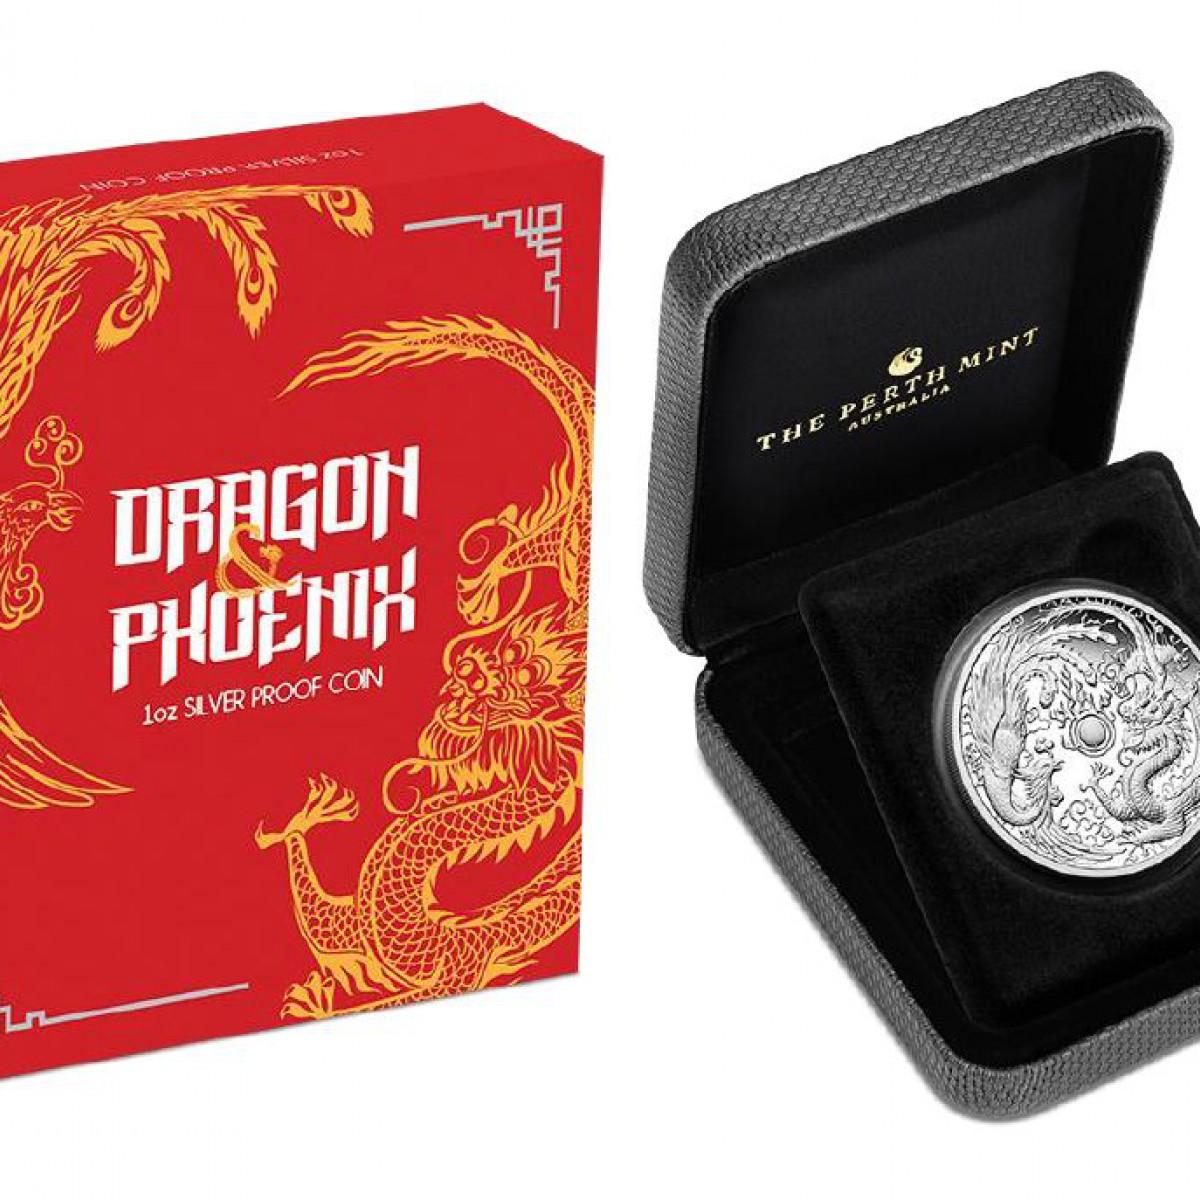 2018 DRAGON & PHOENIX PROOF